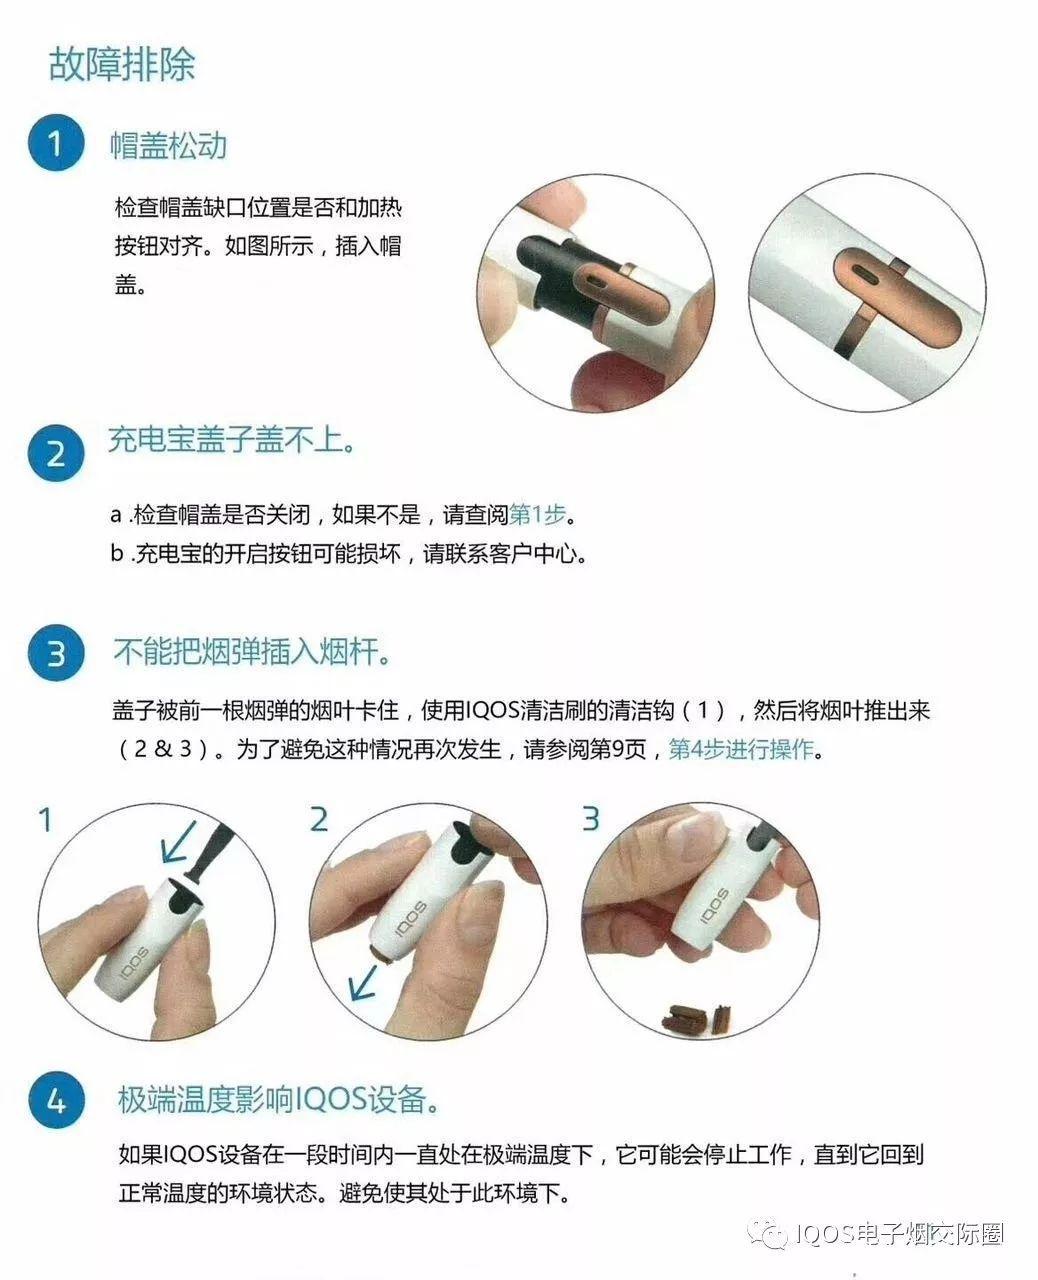 iqos电子烟怎么使用 中文说明书图解来了